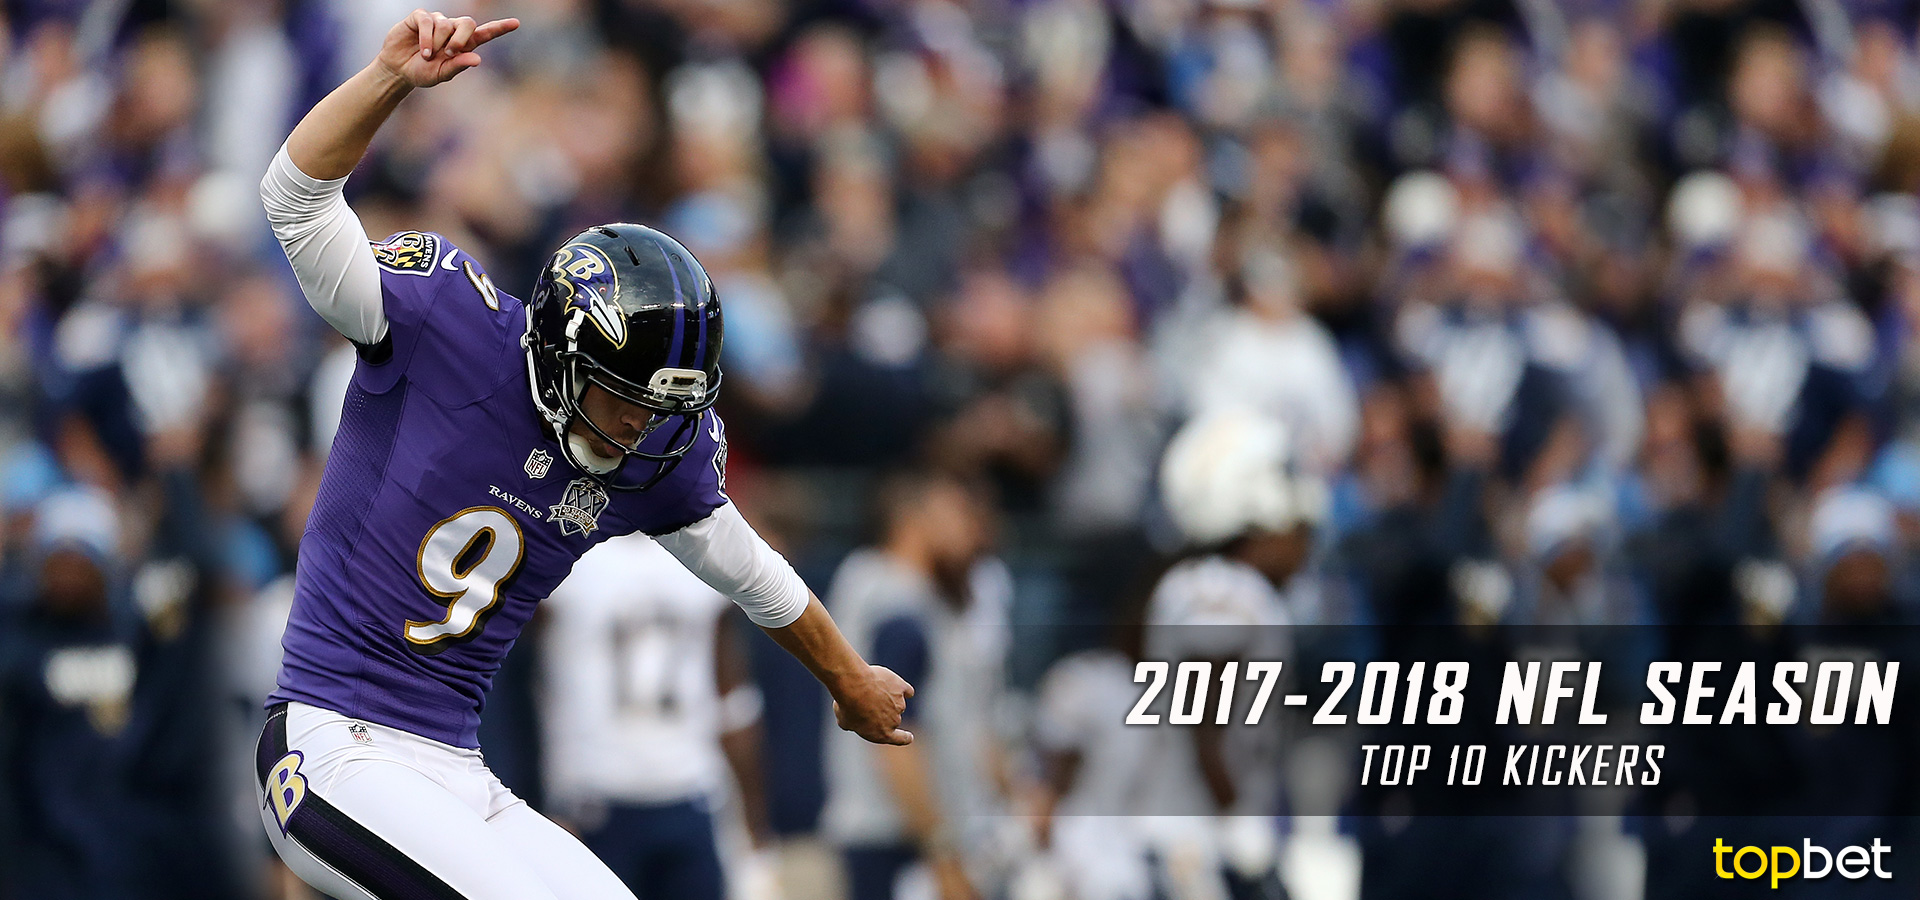 Top NFL Kickers: Best of the 2017-18 NFL Football Season